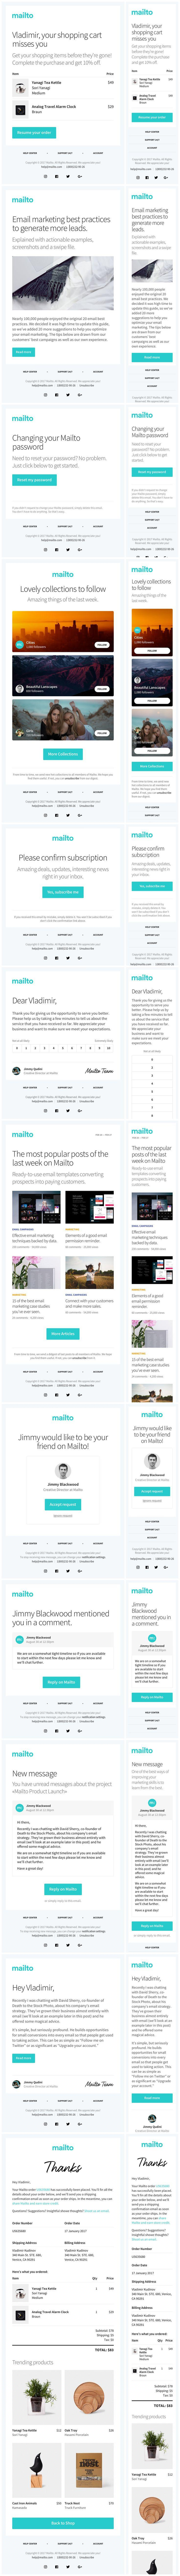 479 best nice very nice ui ux web design inspiration images on